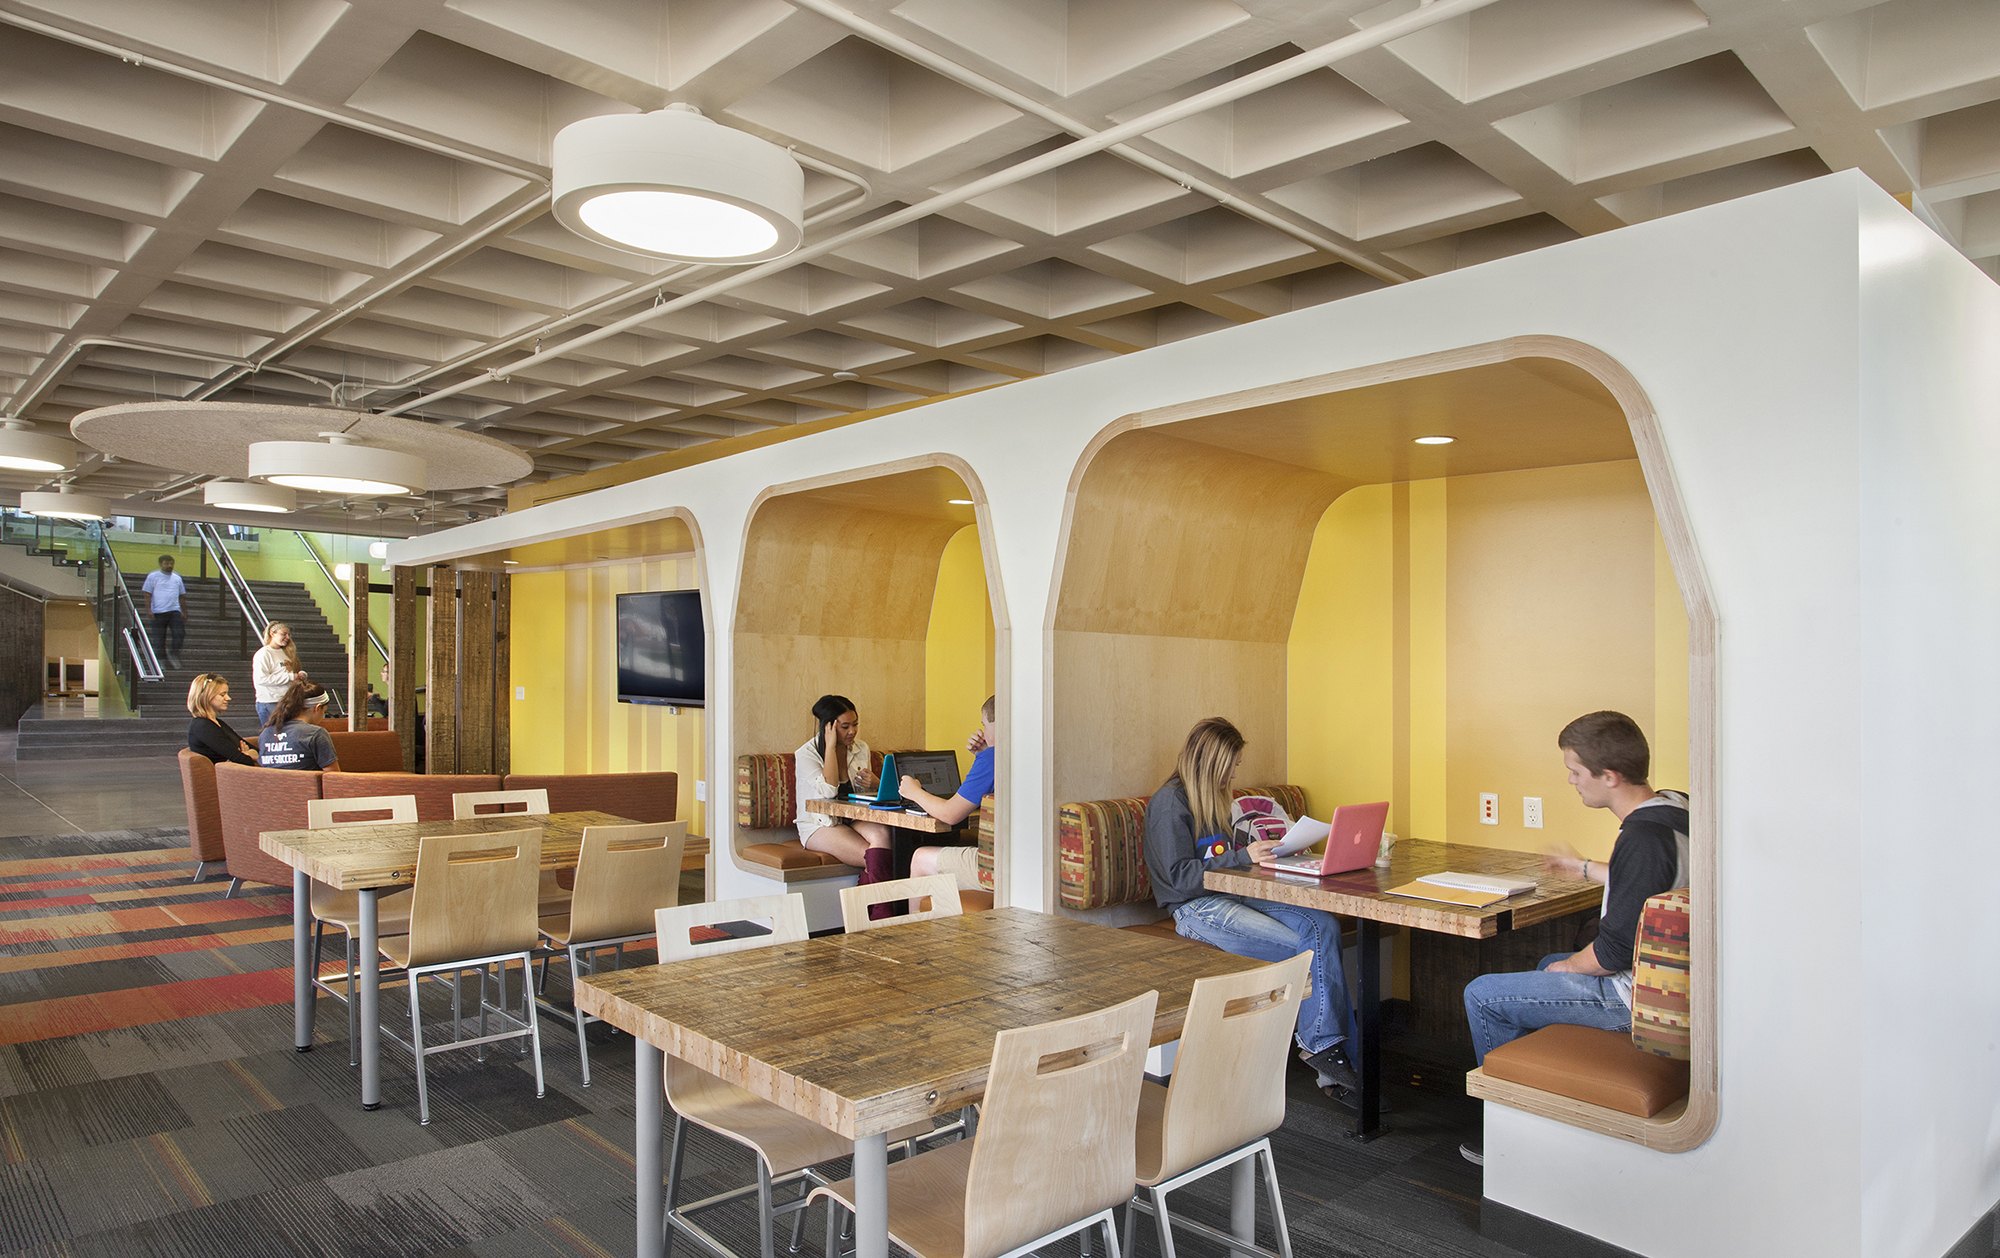 colorado_state_university_fort_collins_durrell_center_study_nook.jpg